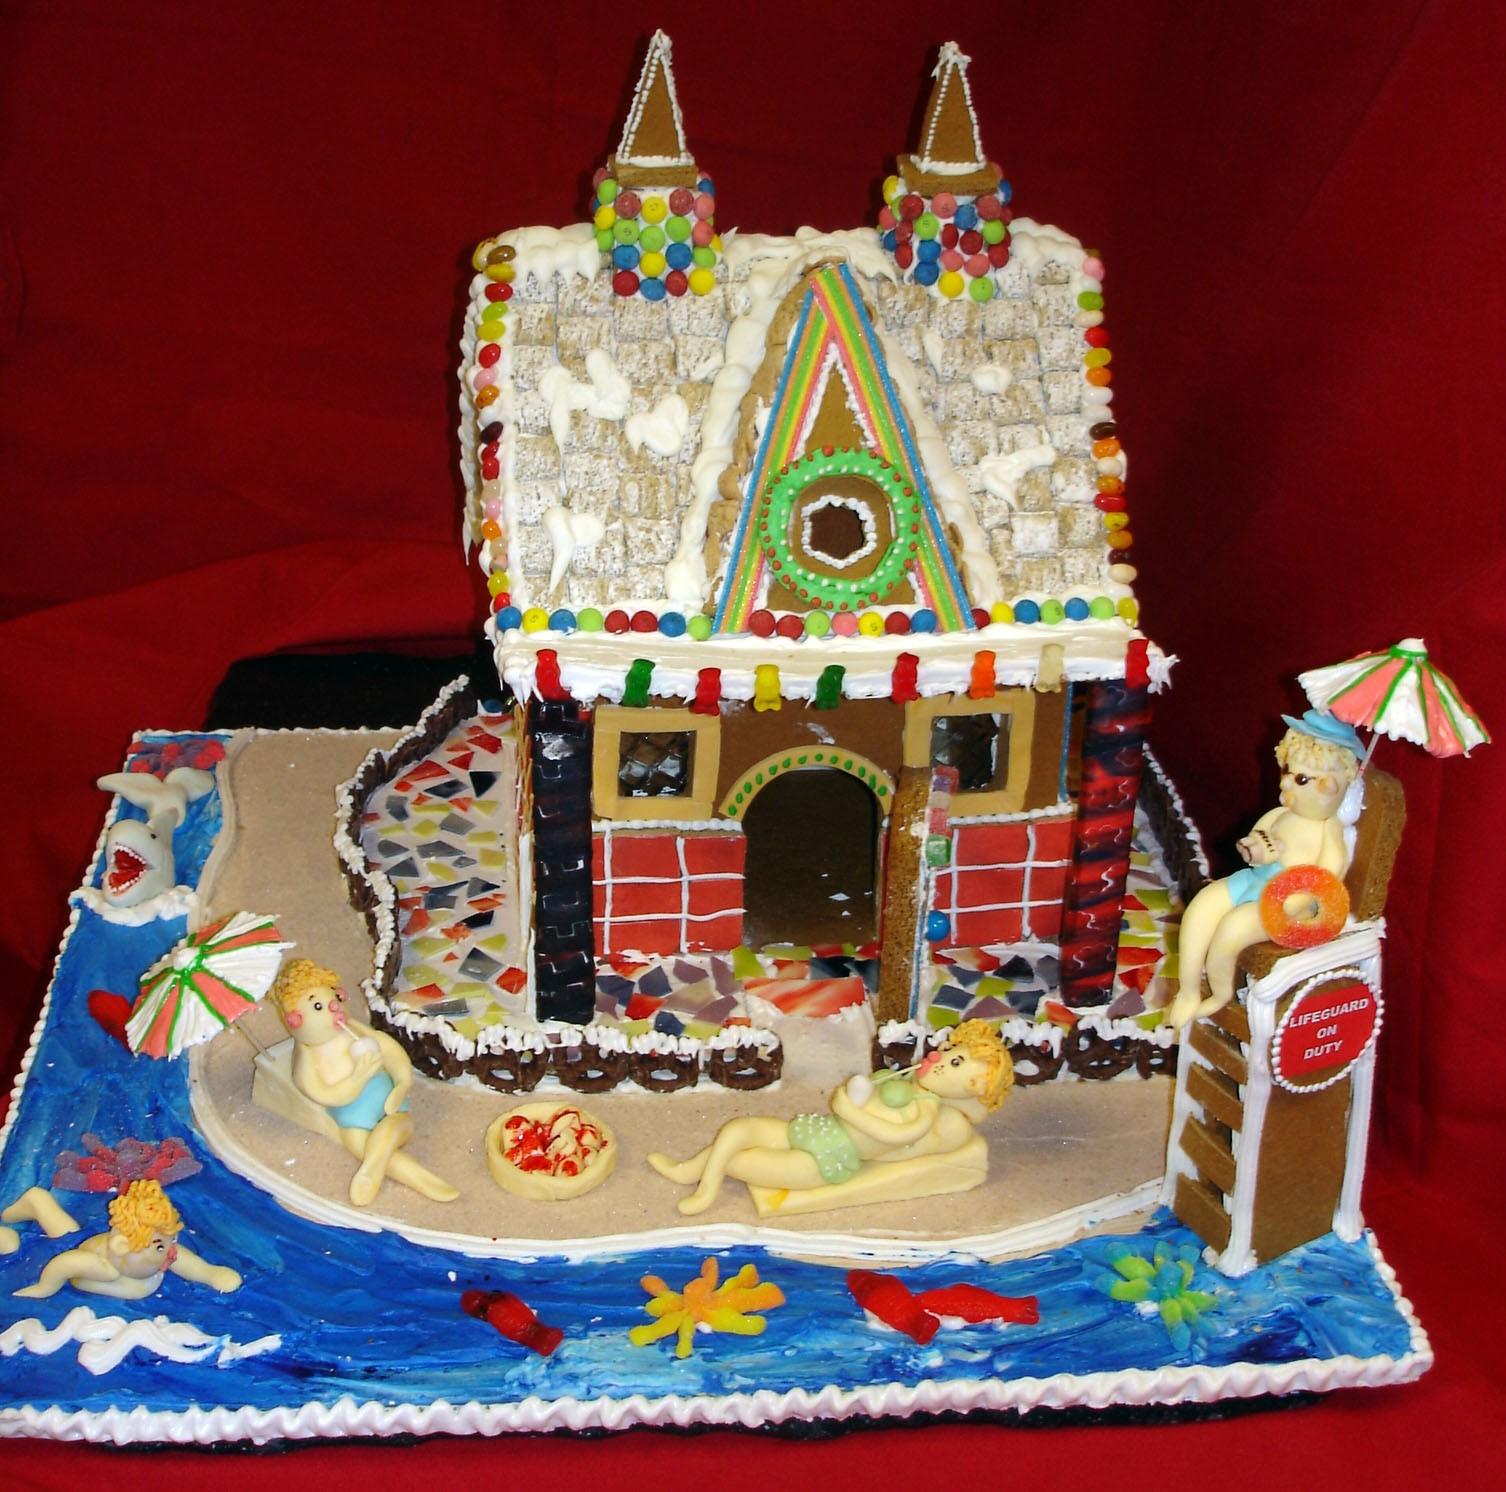 Beach Themed Gingerbread House: OC Mom Activities: December 2010